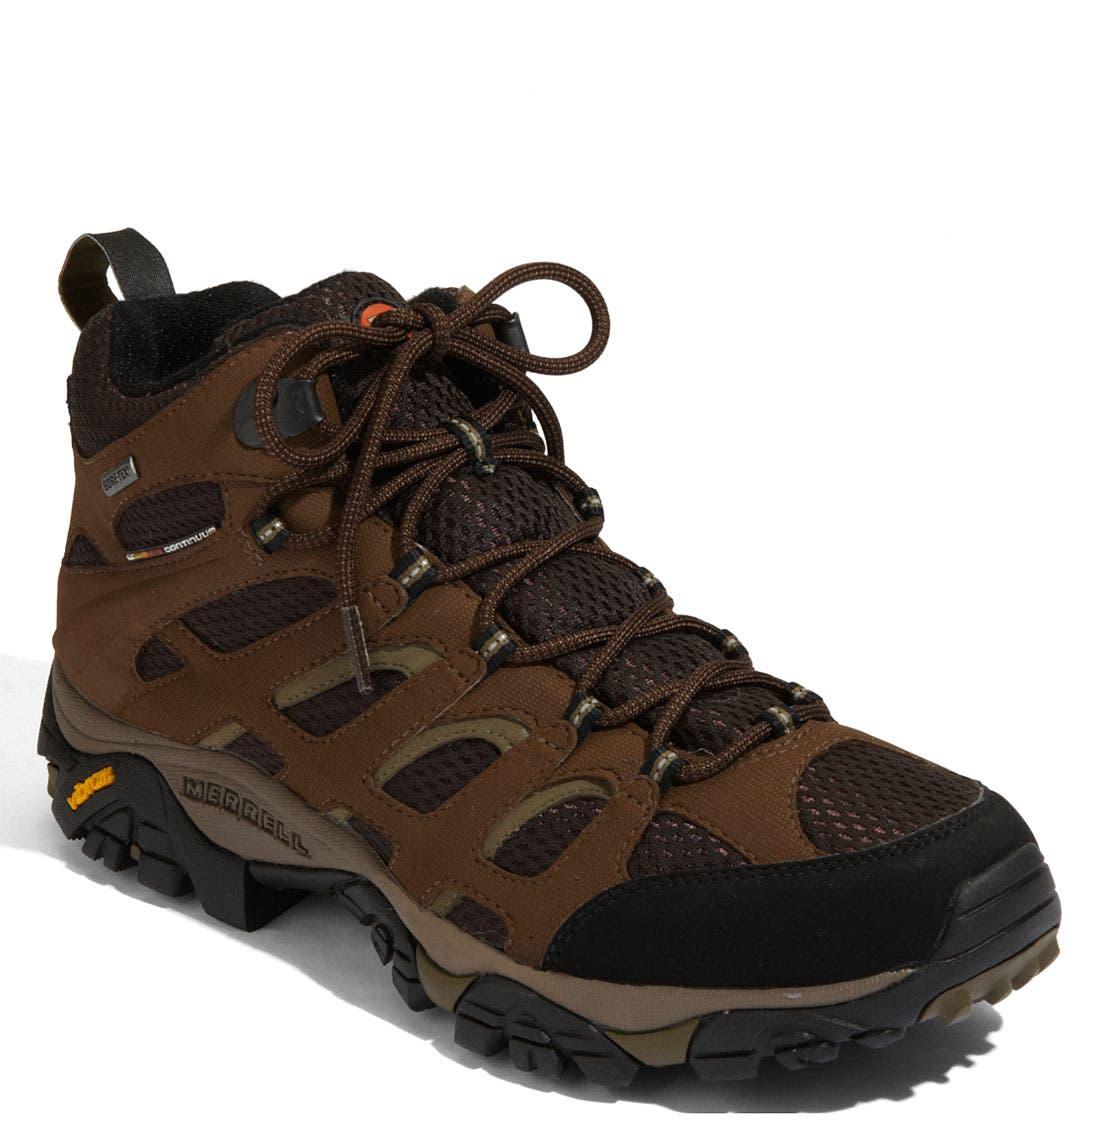 Main Image - Merrell 'Moab Mid Gore-Tex® XCR' Hiking Boot (Men)